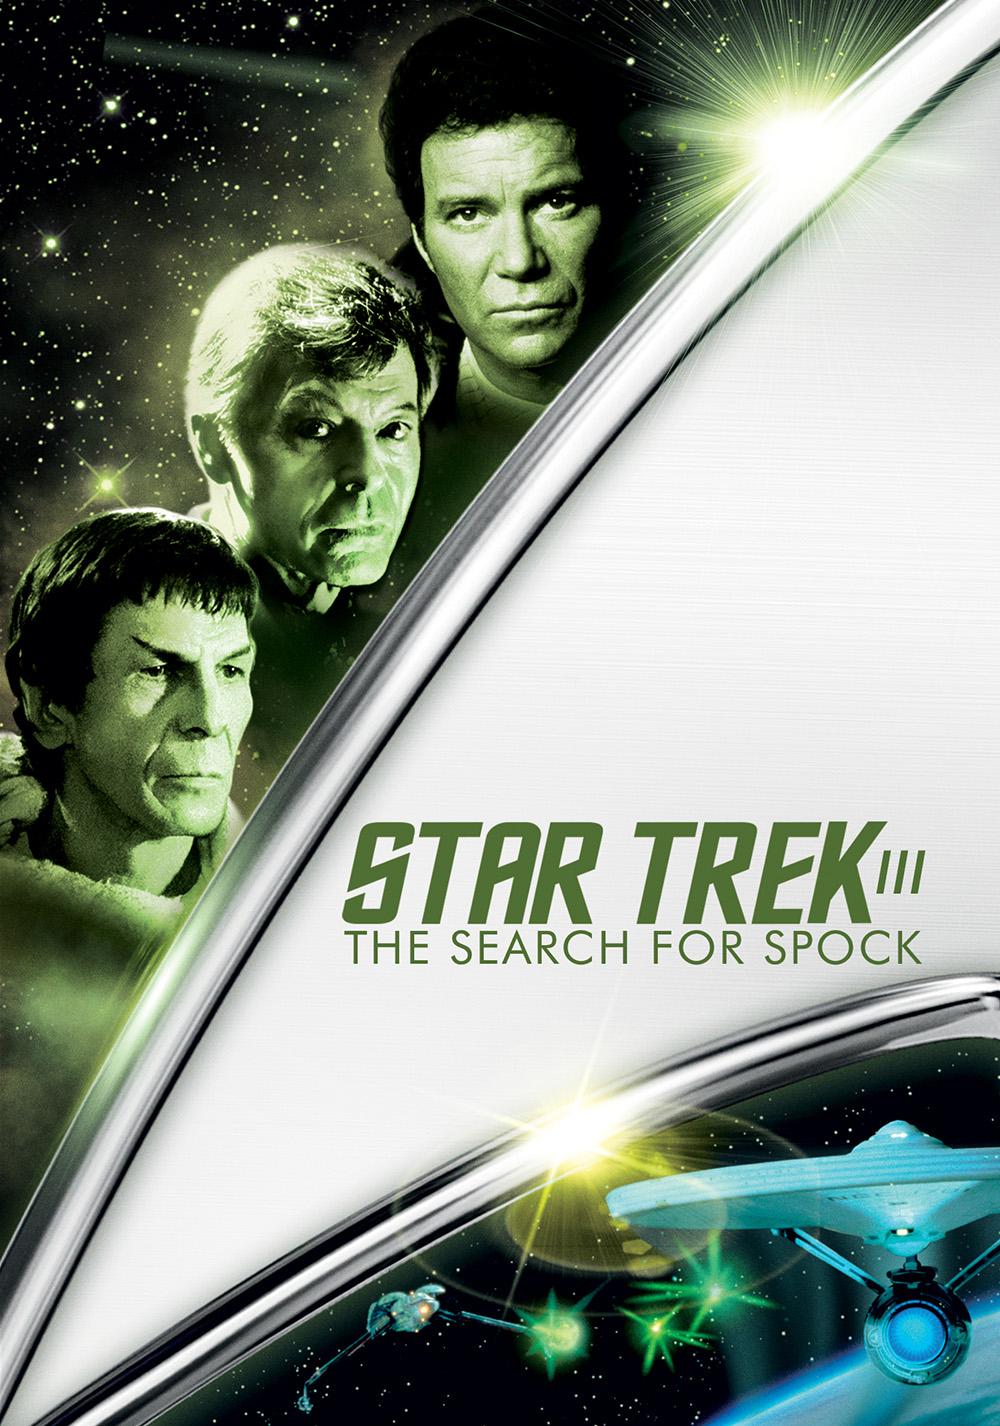 Star Trek III: The Search for Spock (1984) - IMDb